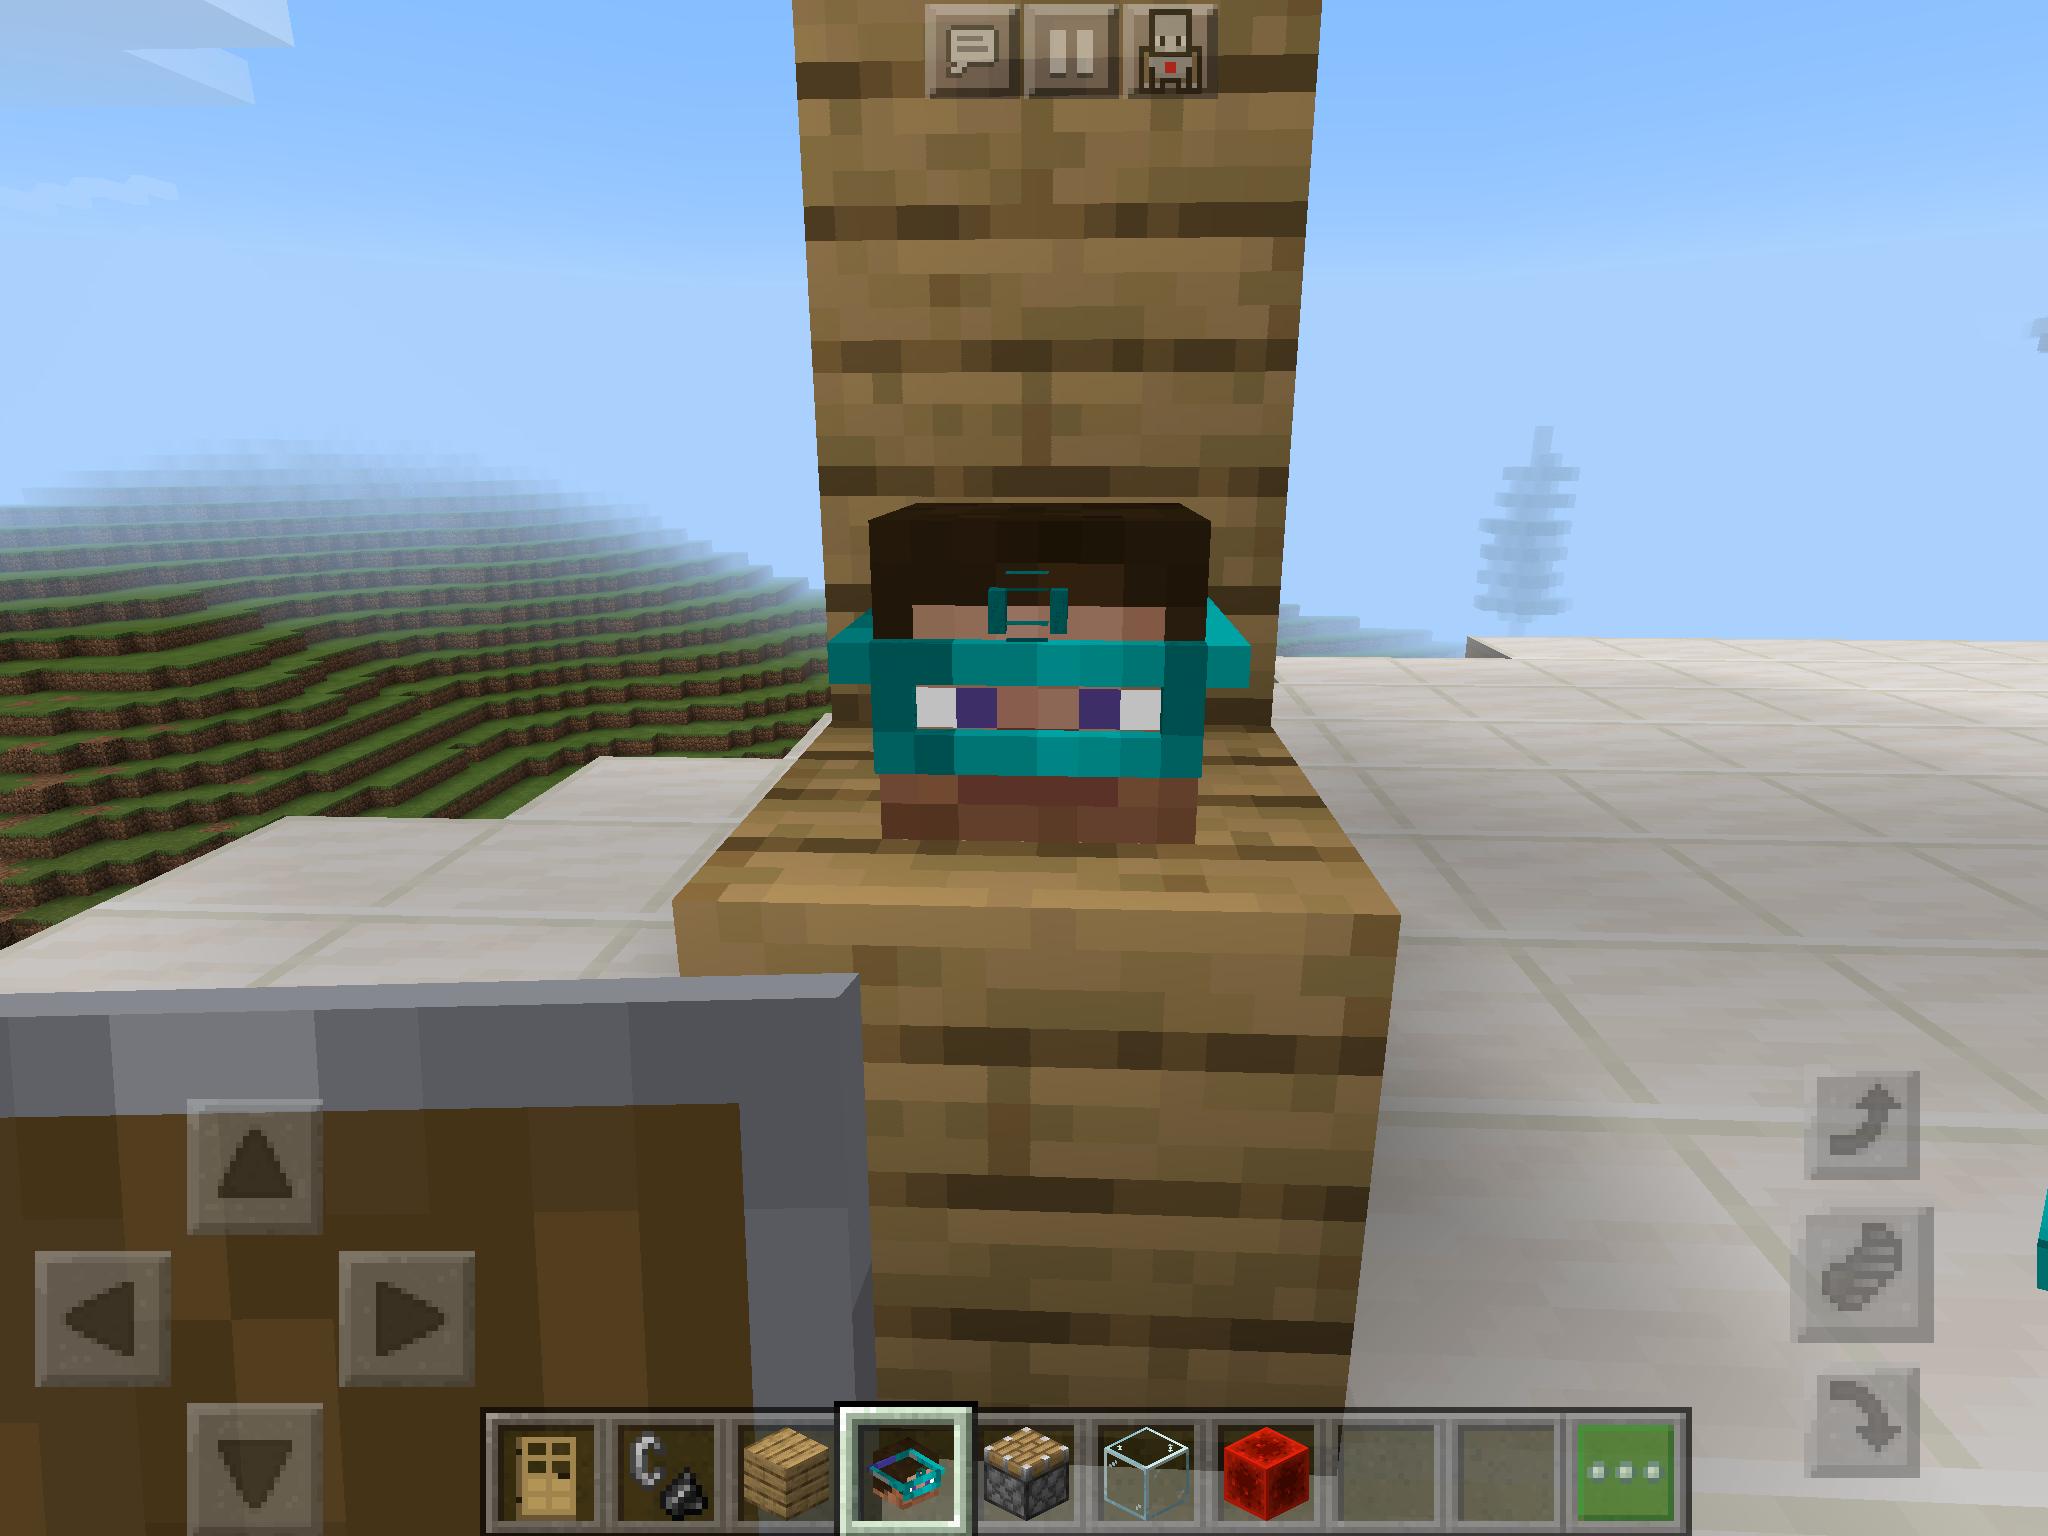 MCPE-12] Minecraft education edition blocks look weird with